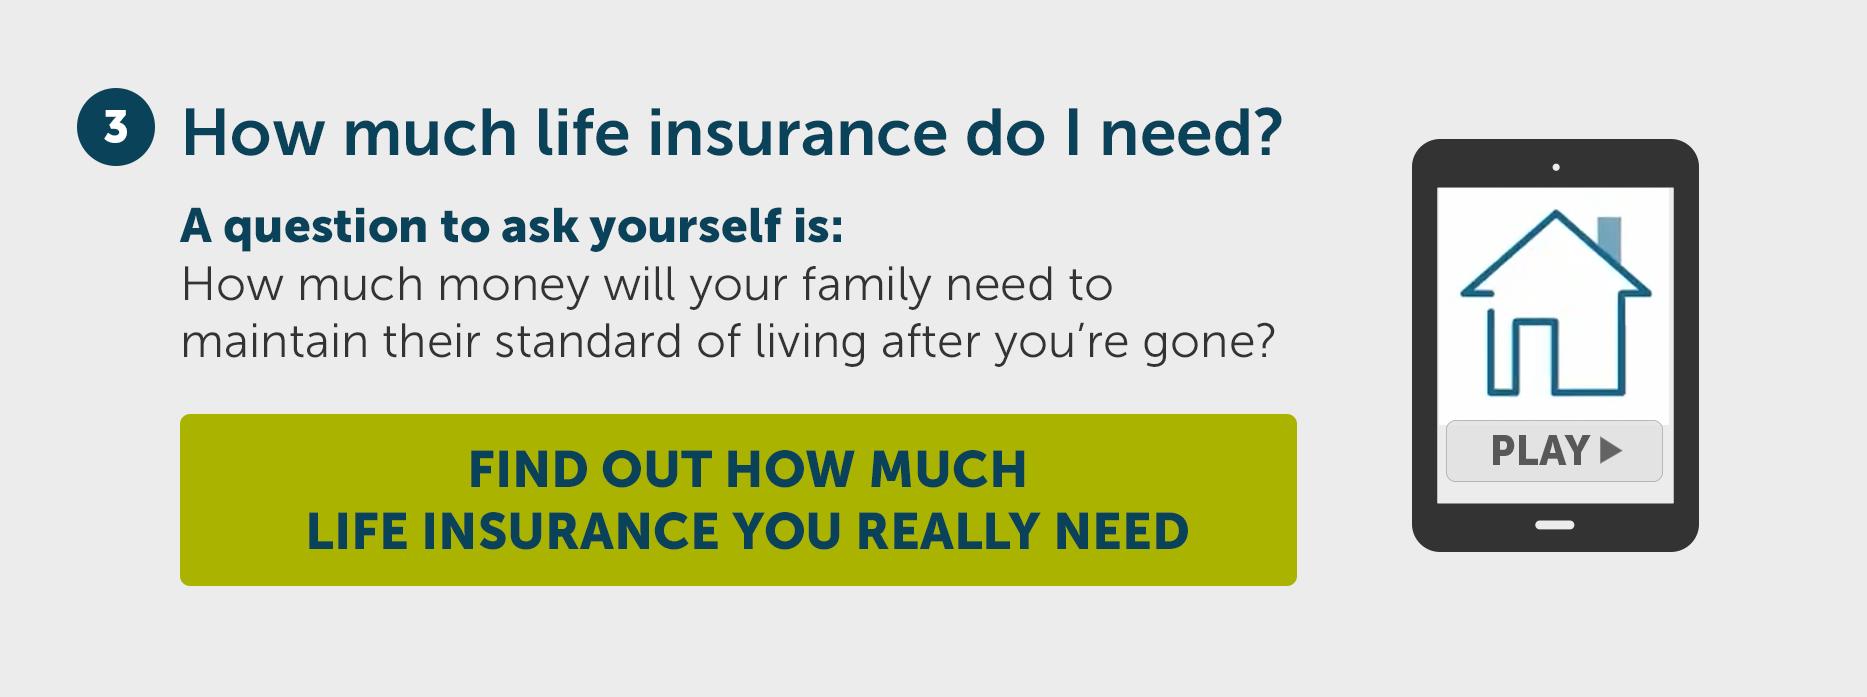 How much life insurance do I need?